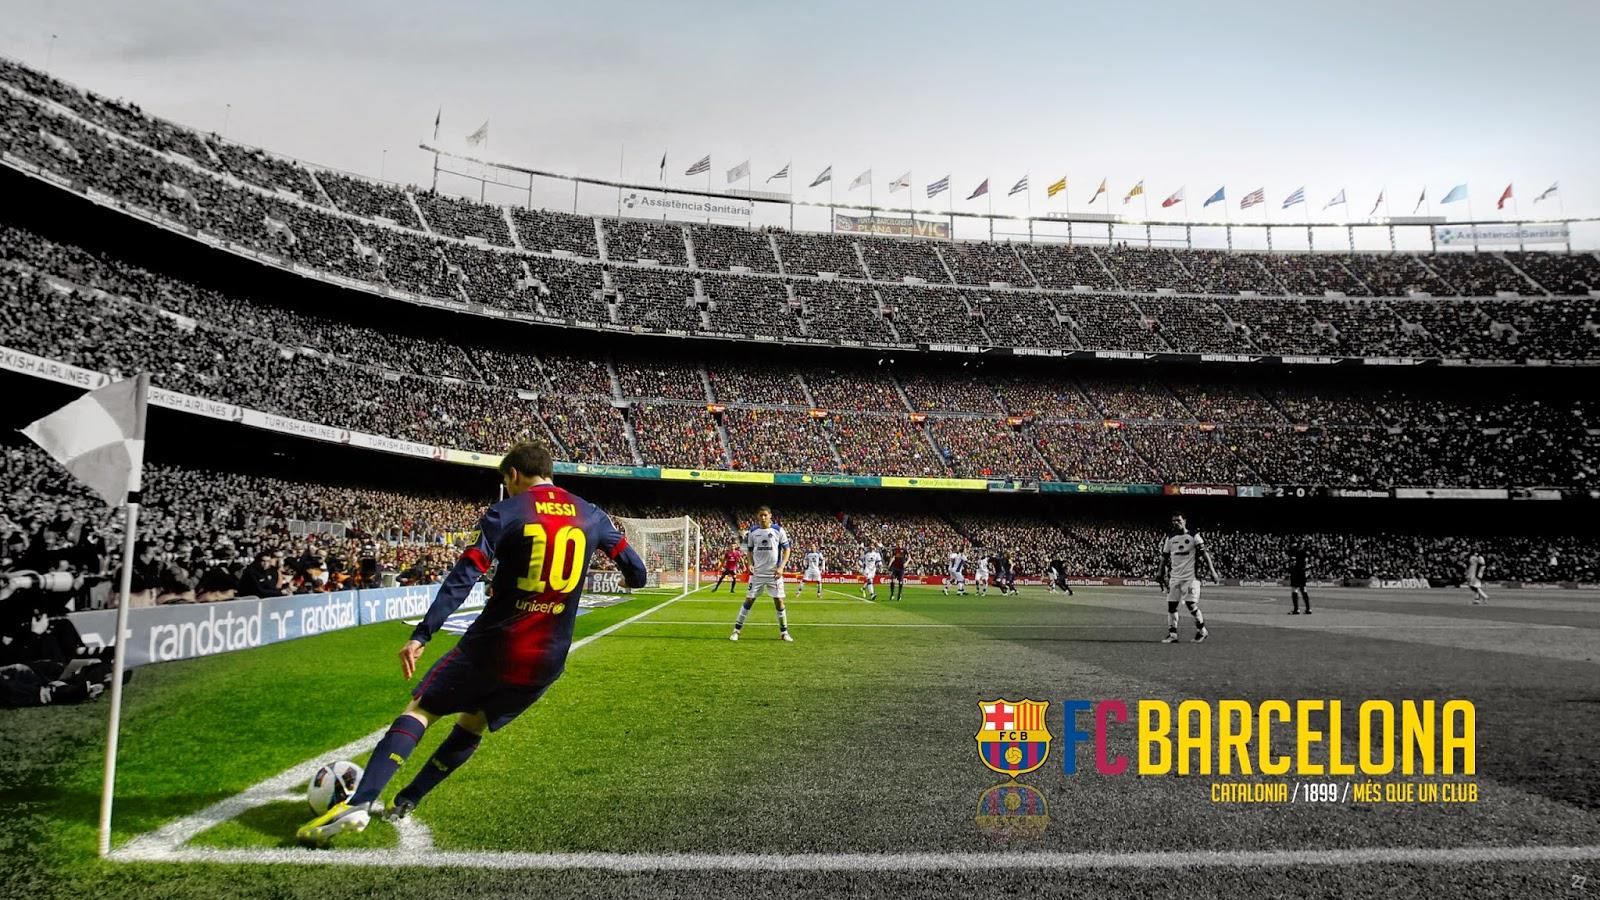 Camp Nou HD Wallpaper Fc Barcelona Photo 1600x900